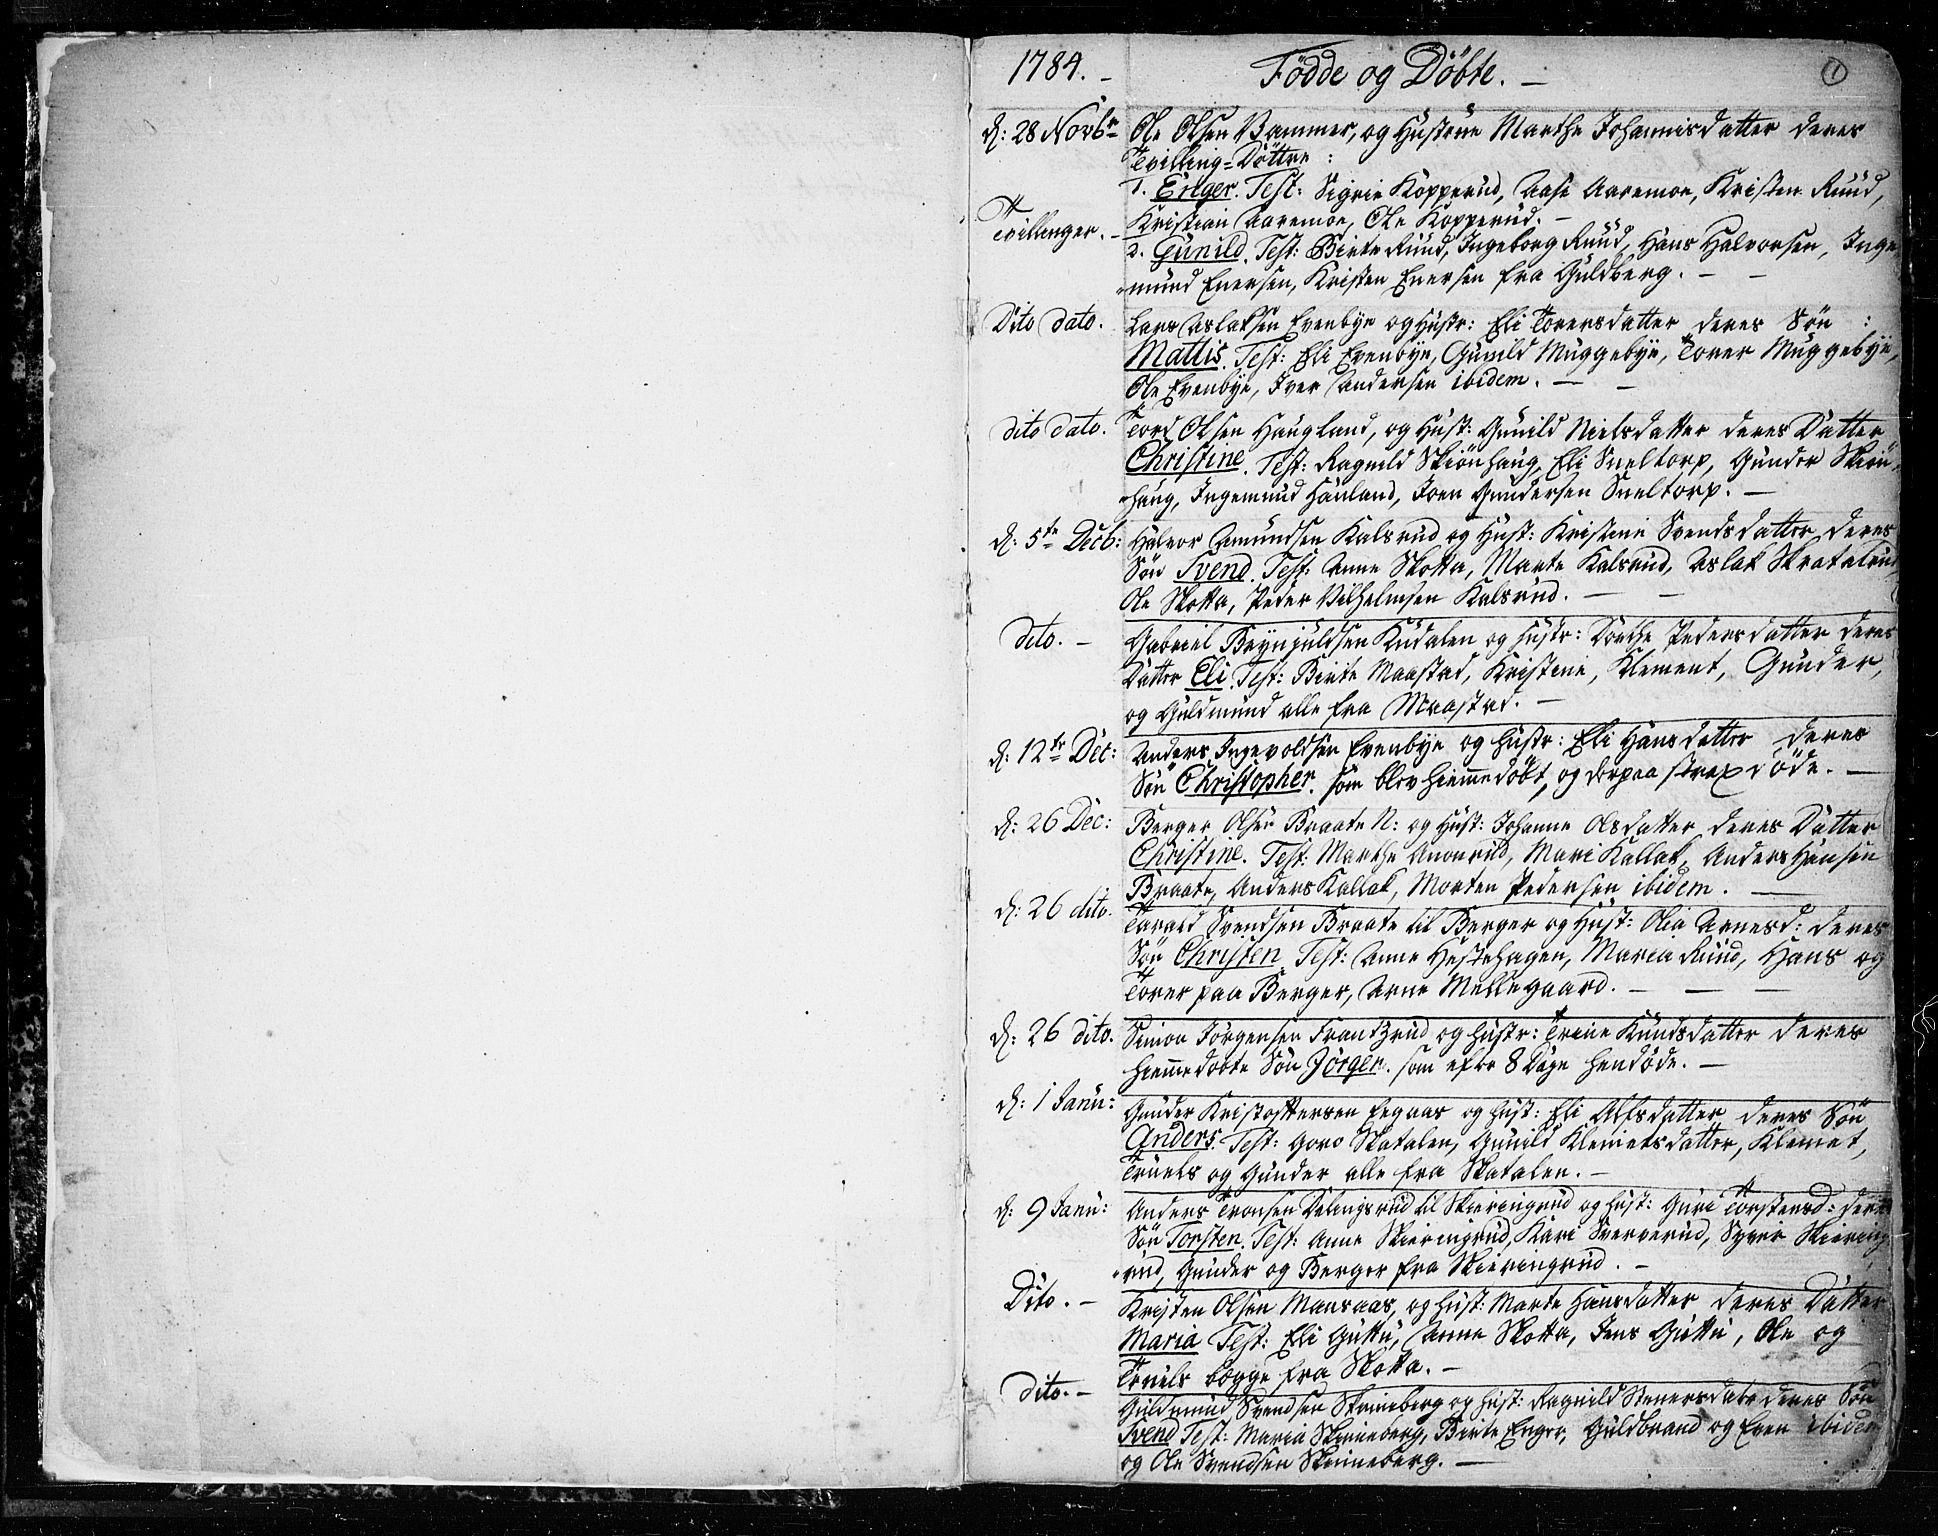 SAO, Trøgstad prestekontor Kirkebøker, F/Fa/L0005: Ministerialbok nr. I 5, 1784-1814, s. 1